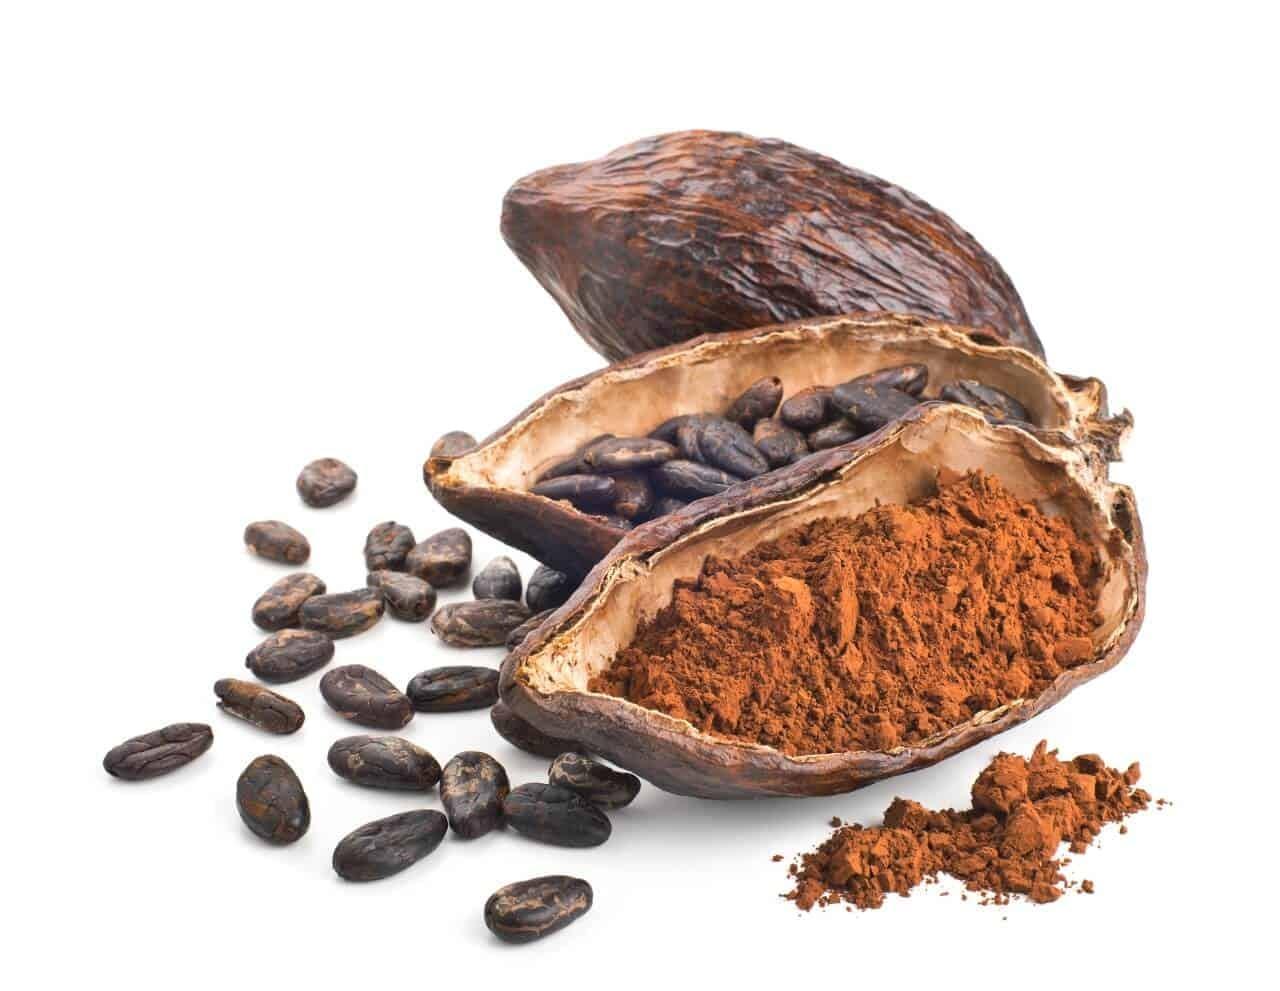 Harga Coklat Bubuk utk Minuman, Resep Minum Coklat +Manfaat Cokelat